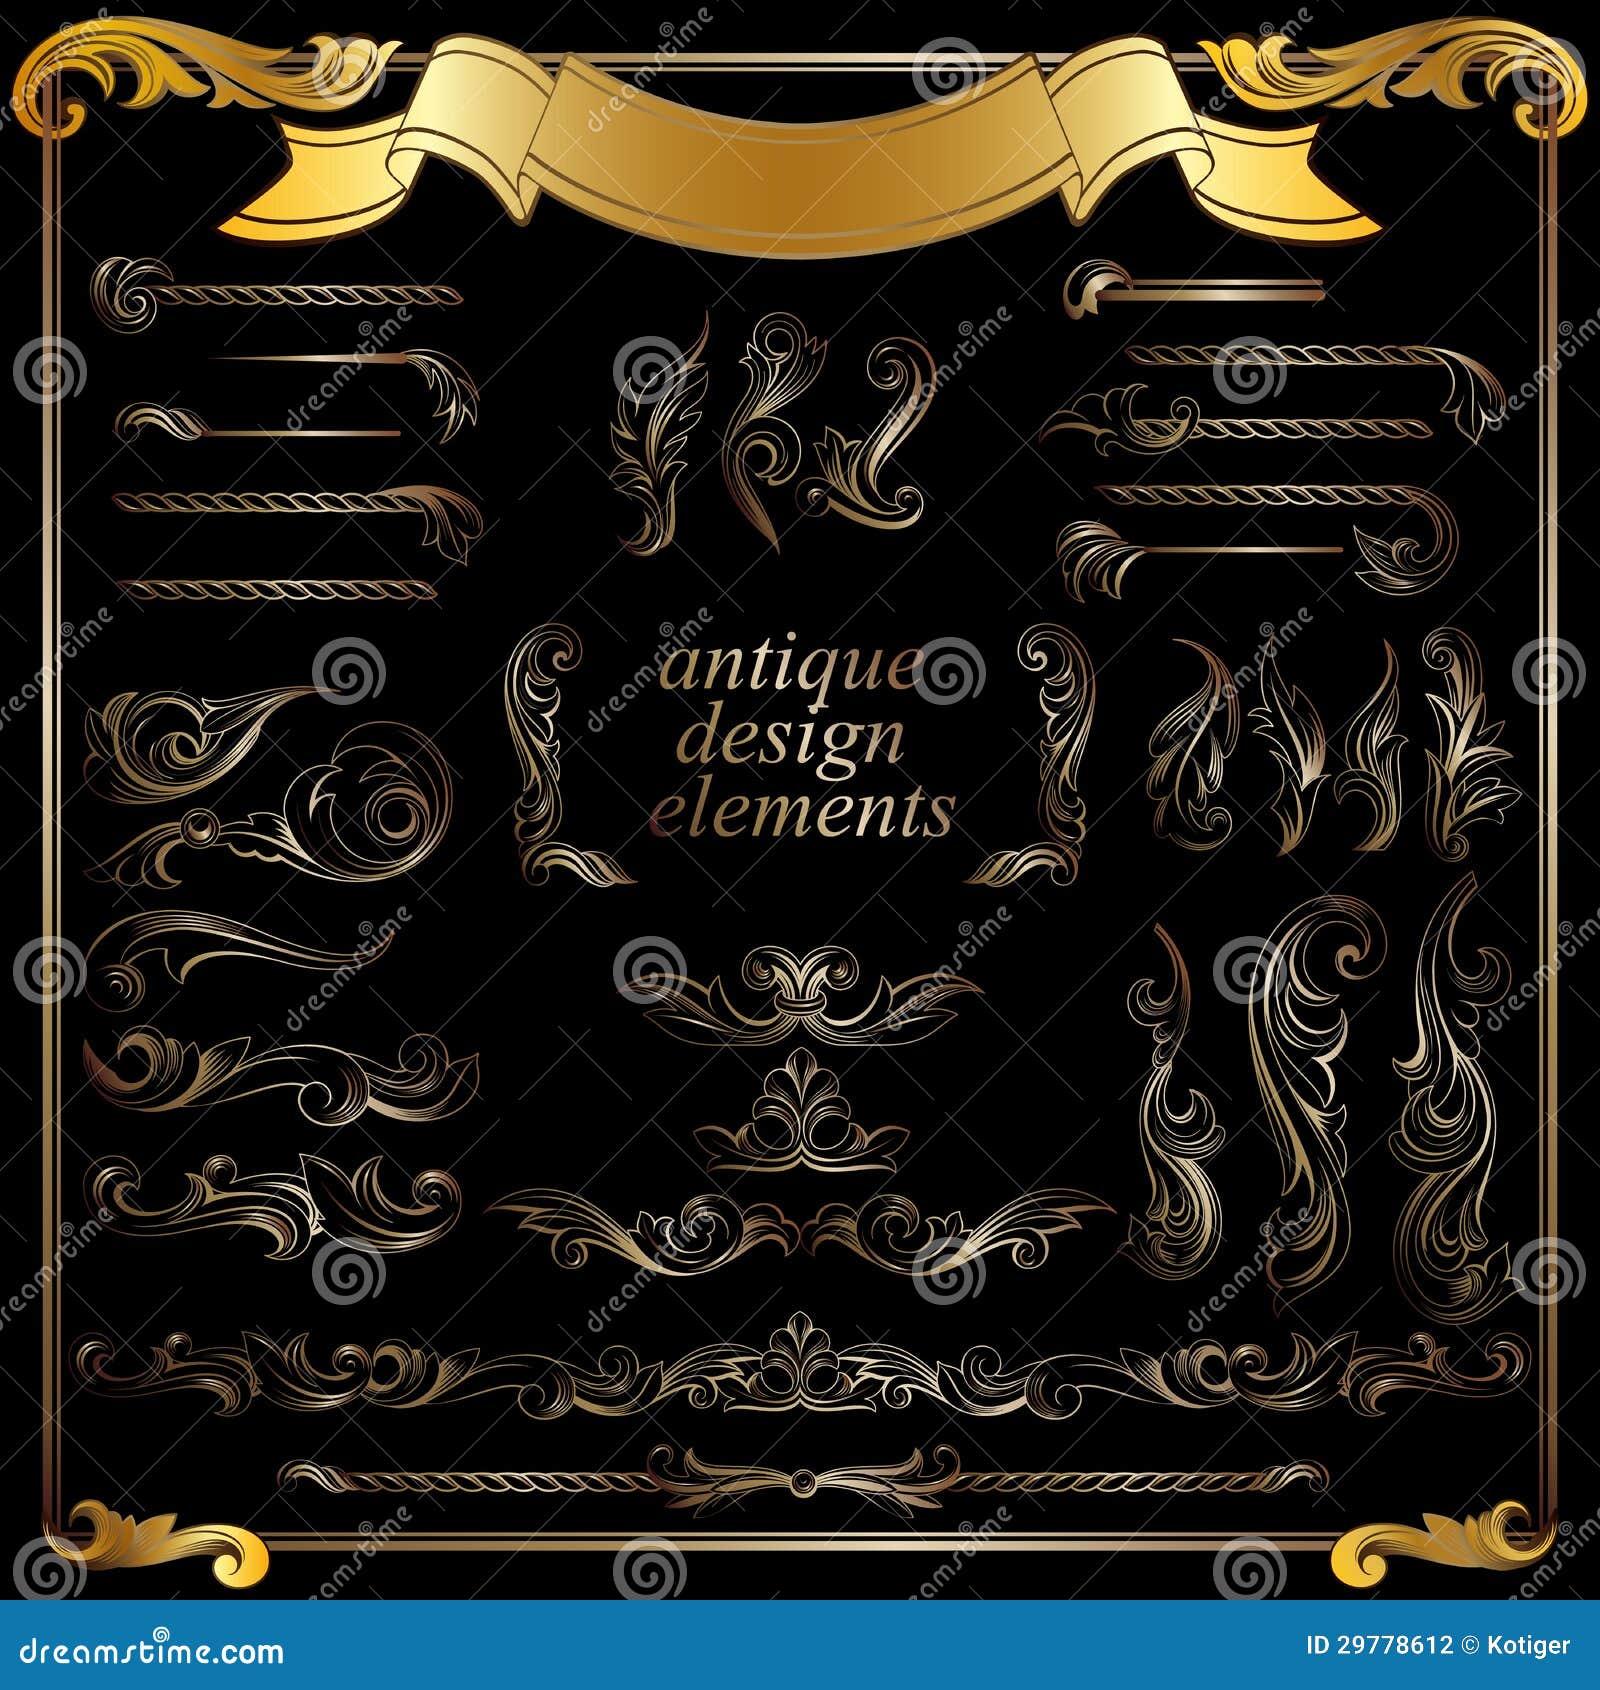 Gold calligraphic design elements decoration stock for Decoration elements